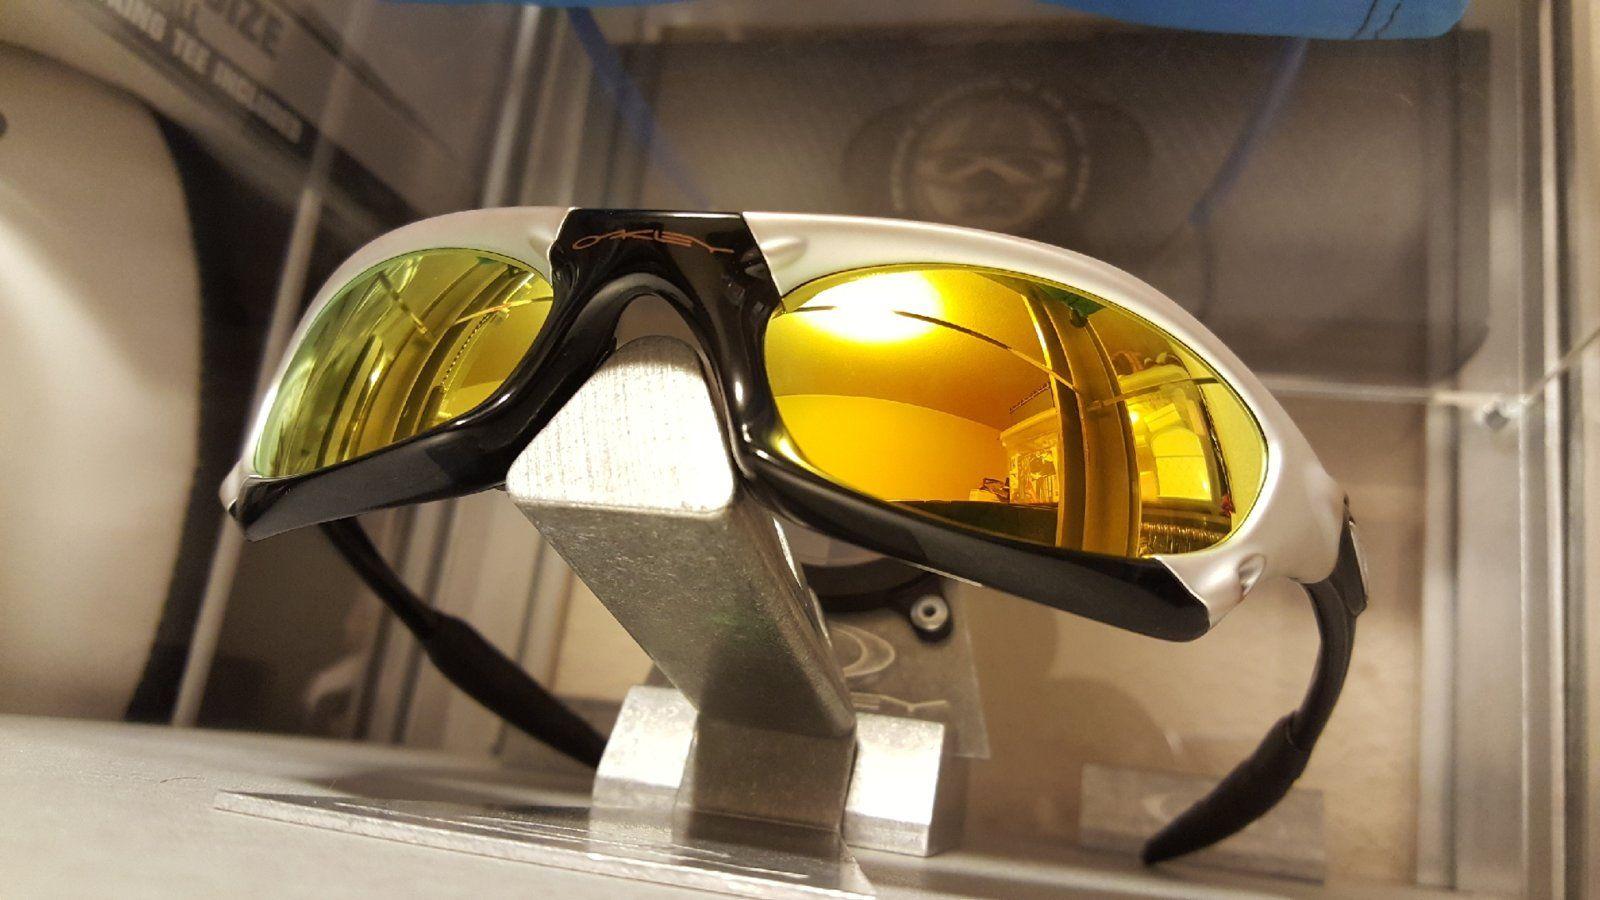 Eye Jacket 3.0 frame - D800279D-B2F6-4E89-AFF7-7C565CB9E8C3.jpeg